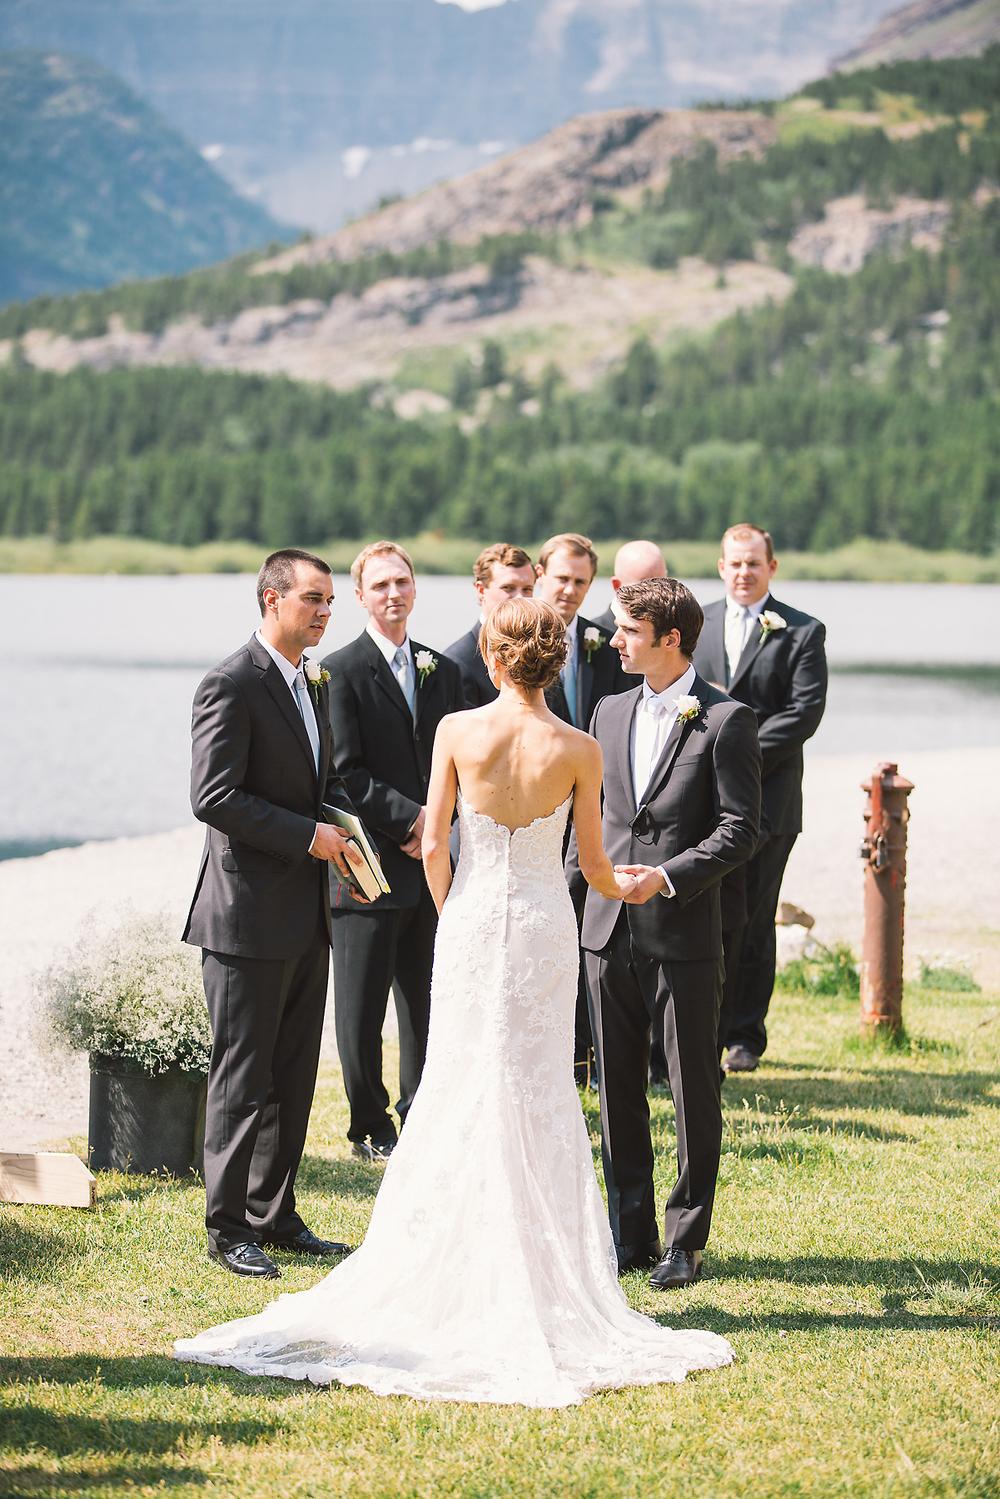 brett-birdsong-photography-082814-vows.jpg